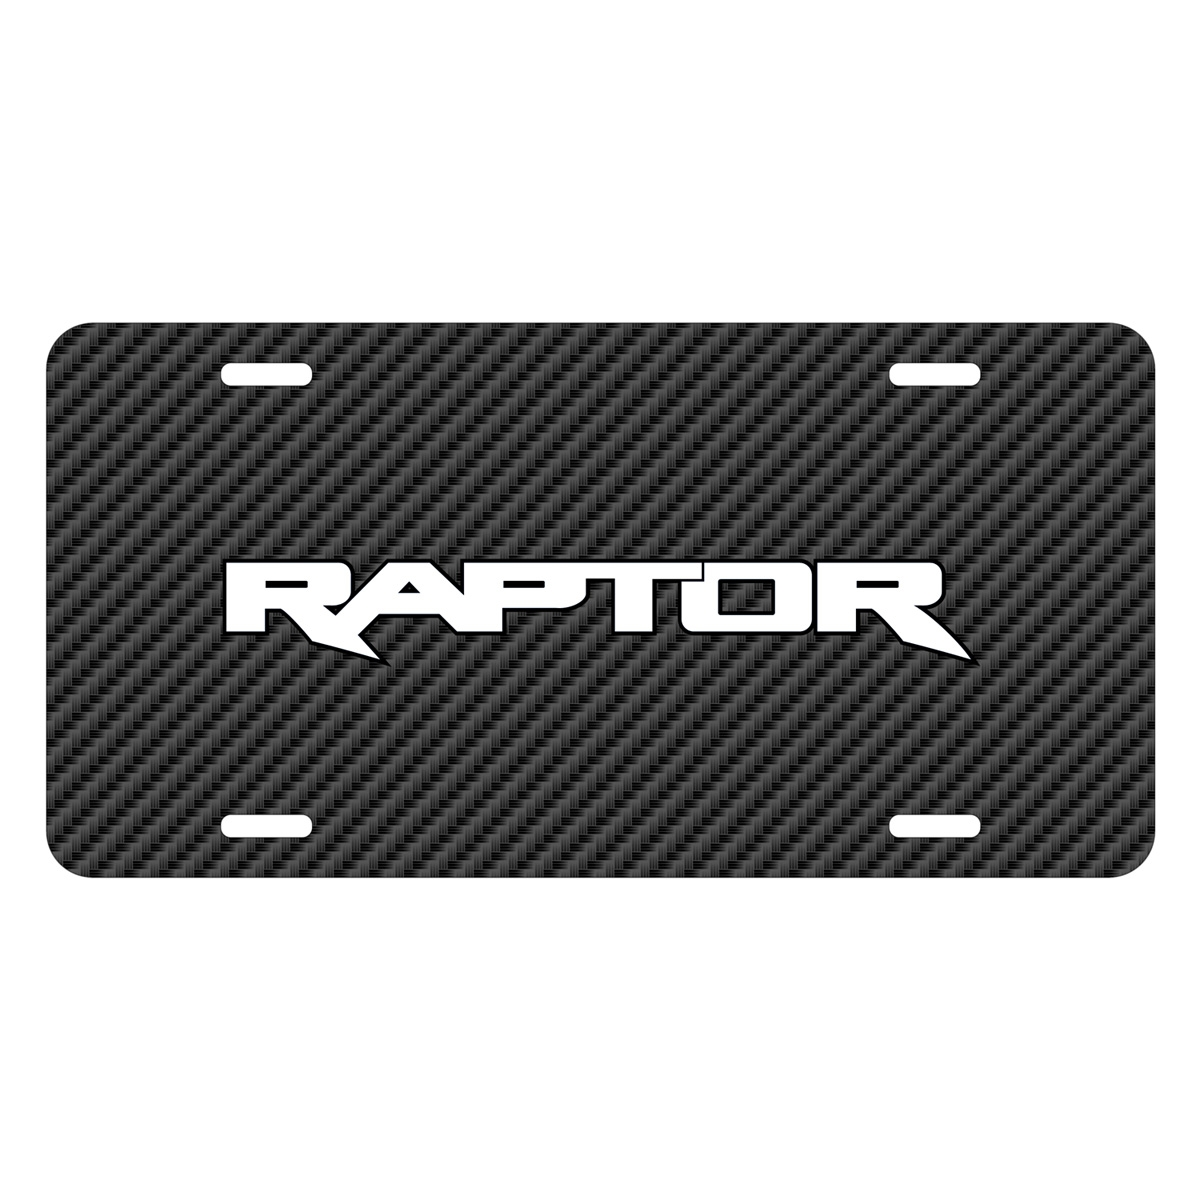 Ford F-150 Raptor 2017 Black Carbon Fiber Texture Graphic UV Metal License Plate